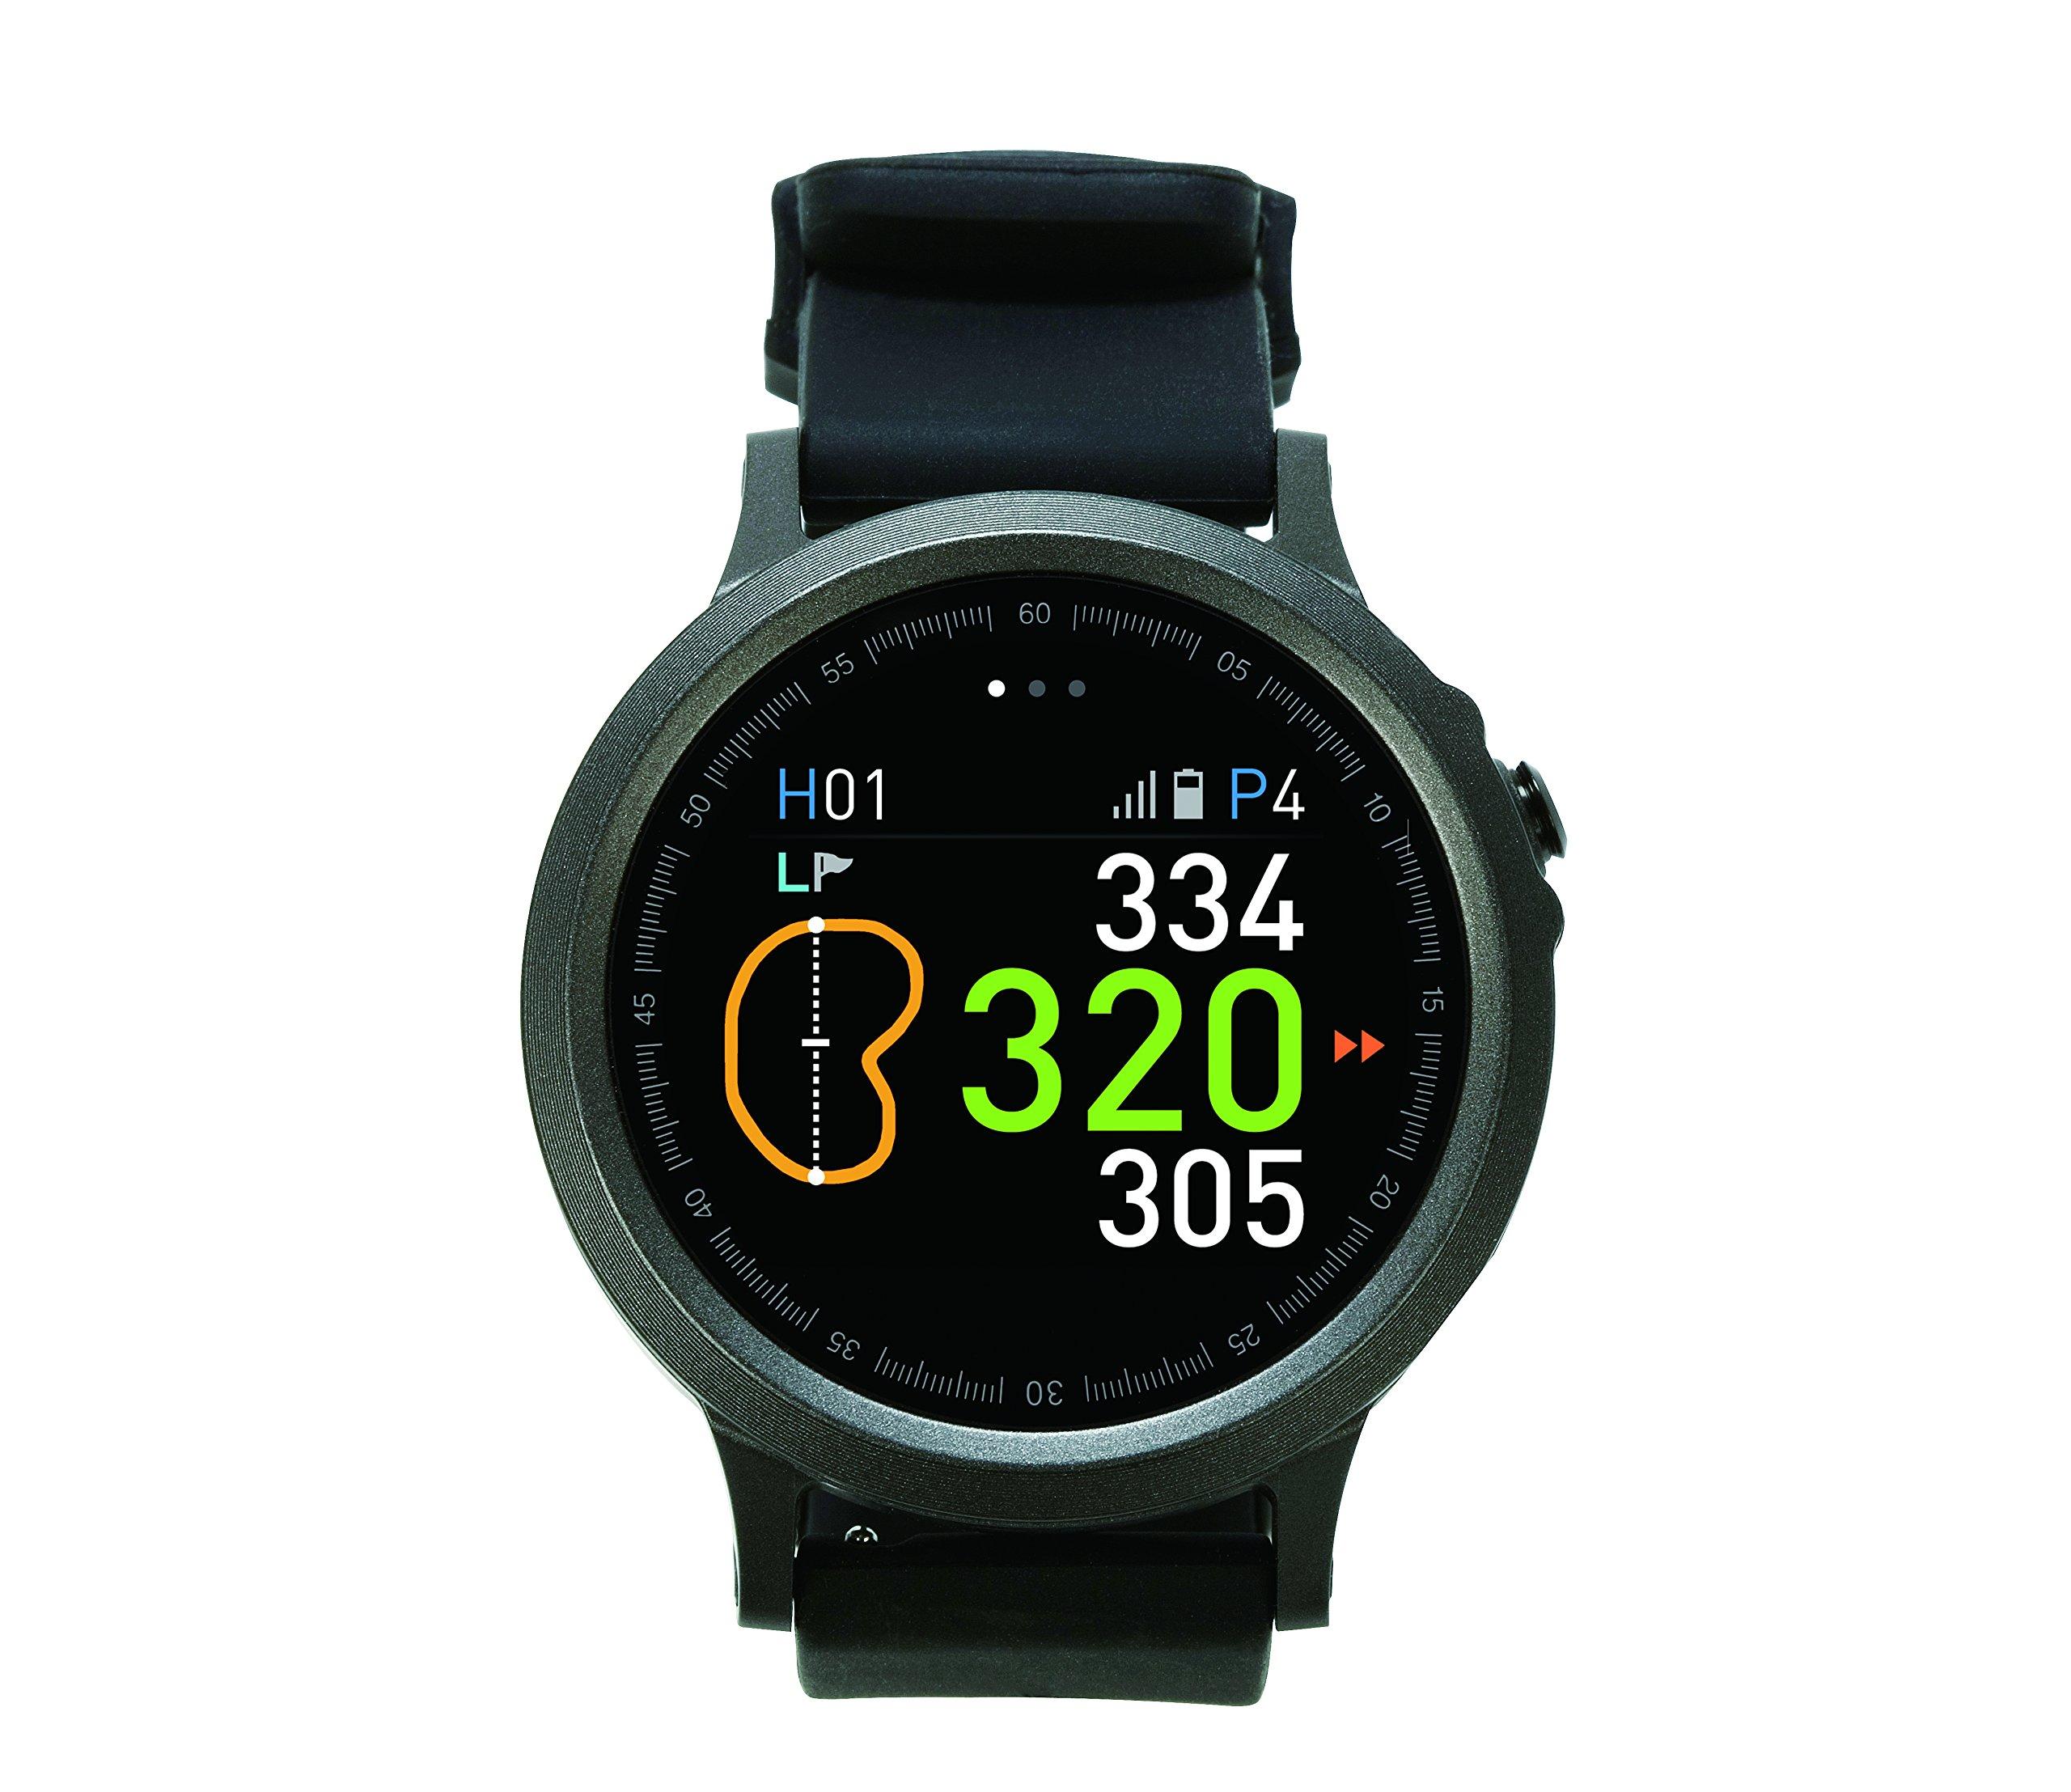 GolfBuddy WTX Smart Golf GPS Watch, Black by GolfBuddy (Image #3)